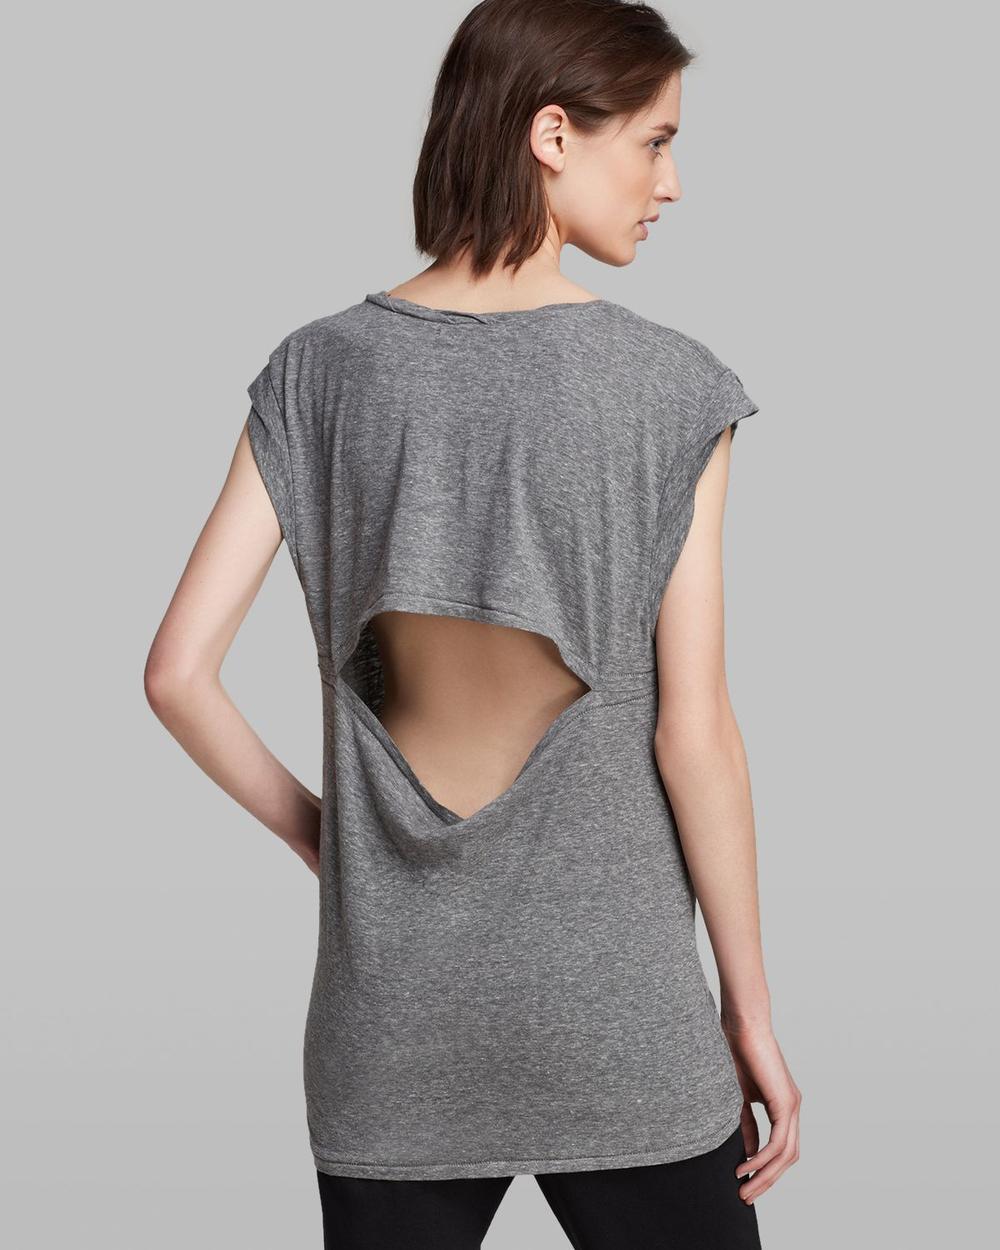 pam-gela-gray-muscle-tee-logo-print-slash-back-t-shirts-product-1-21032331-0-203436178-normal.jpeg